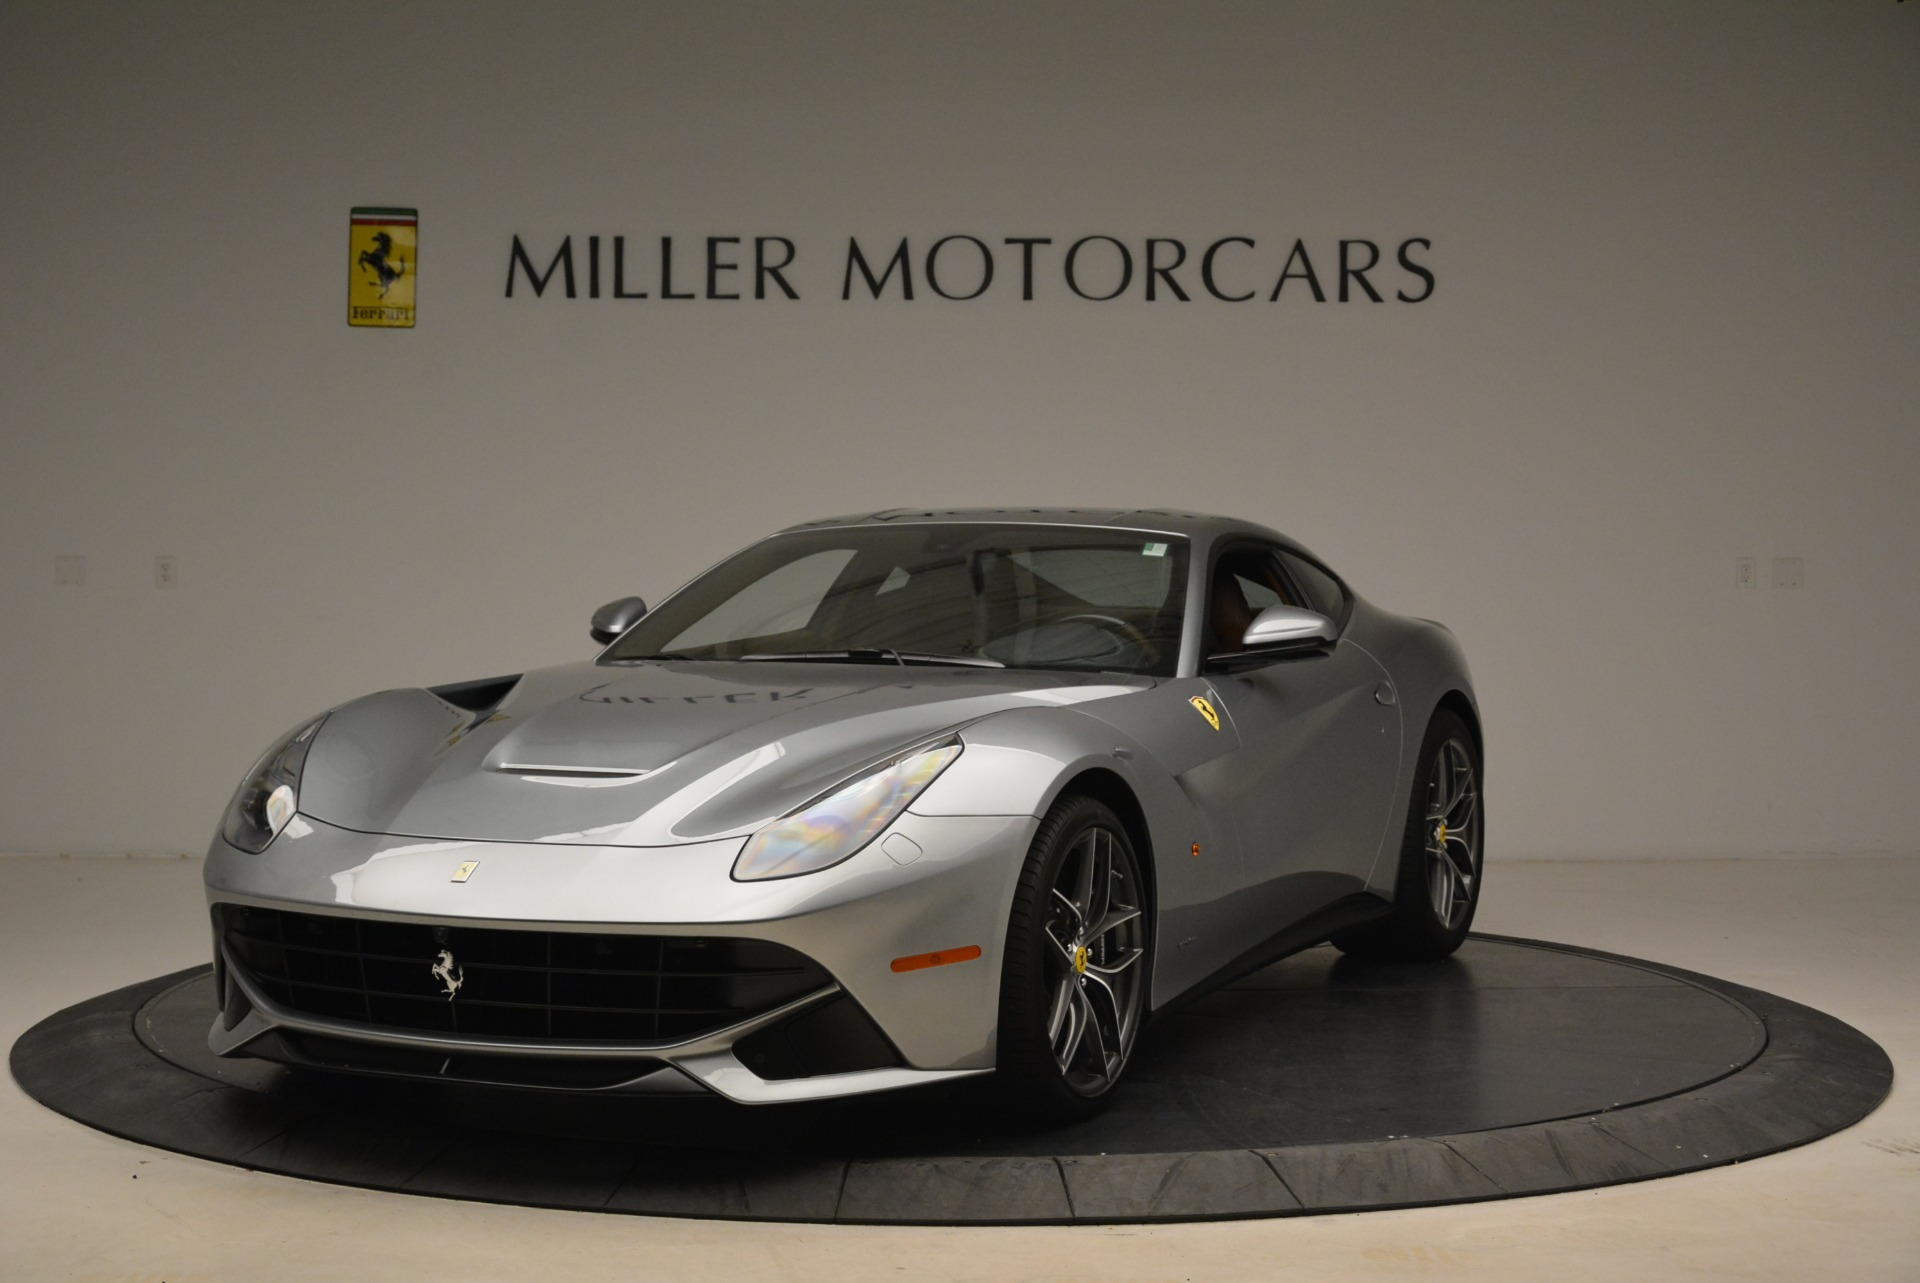 Used 2017 Ferrari F12 Berlinetta for sale Sold at Pagani of Greenwich in Greenwich CT 06830 1